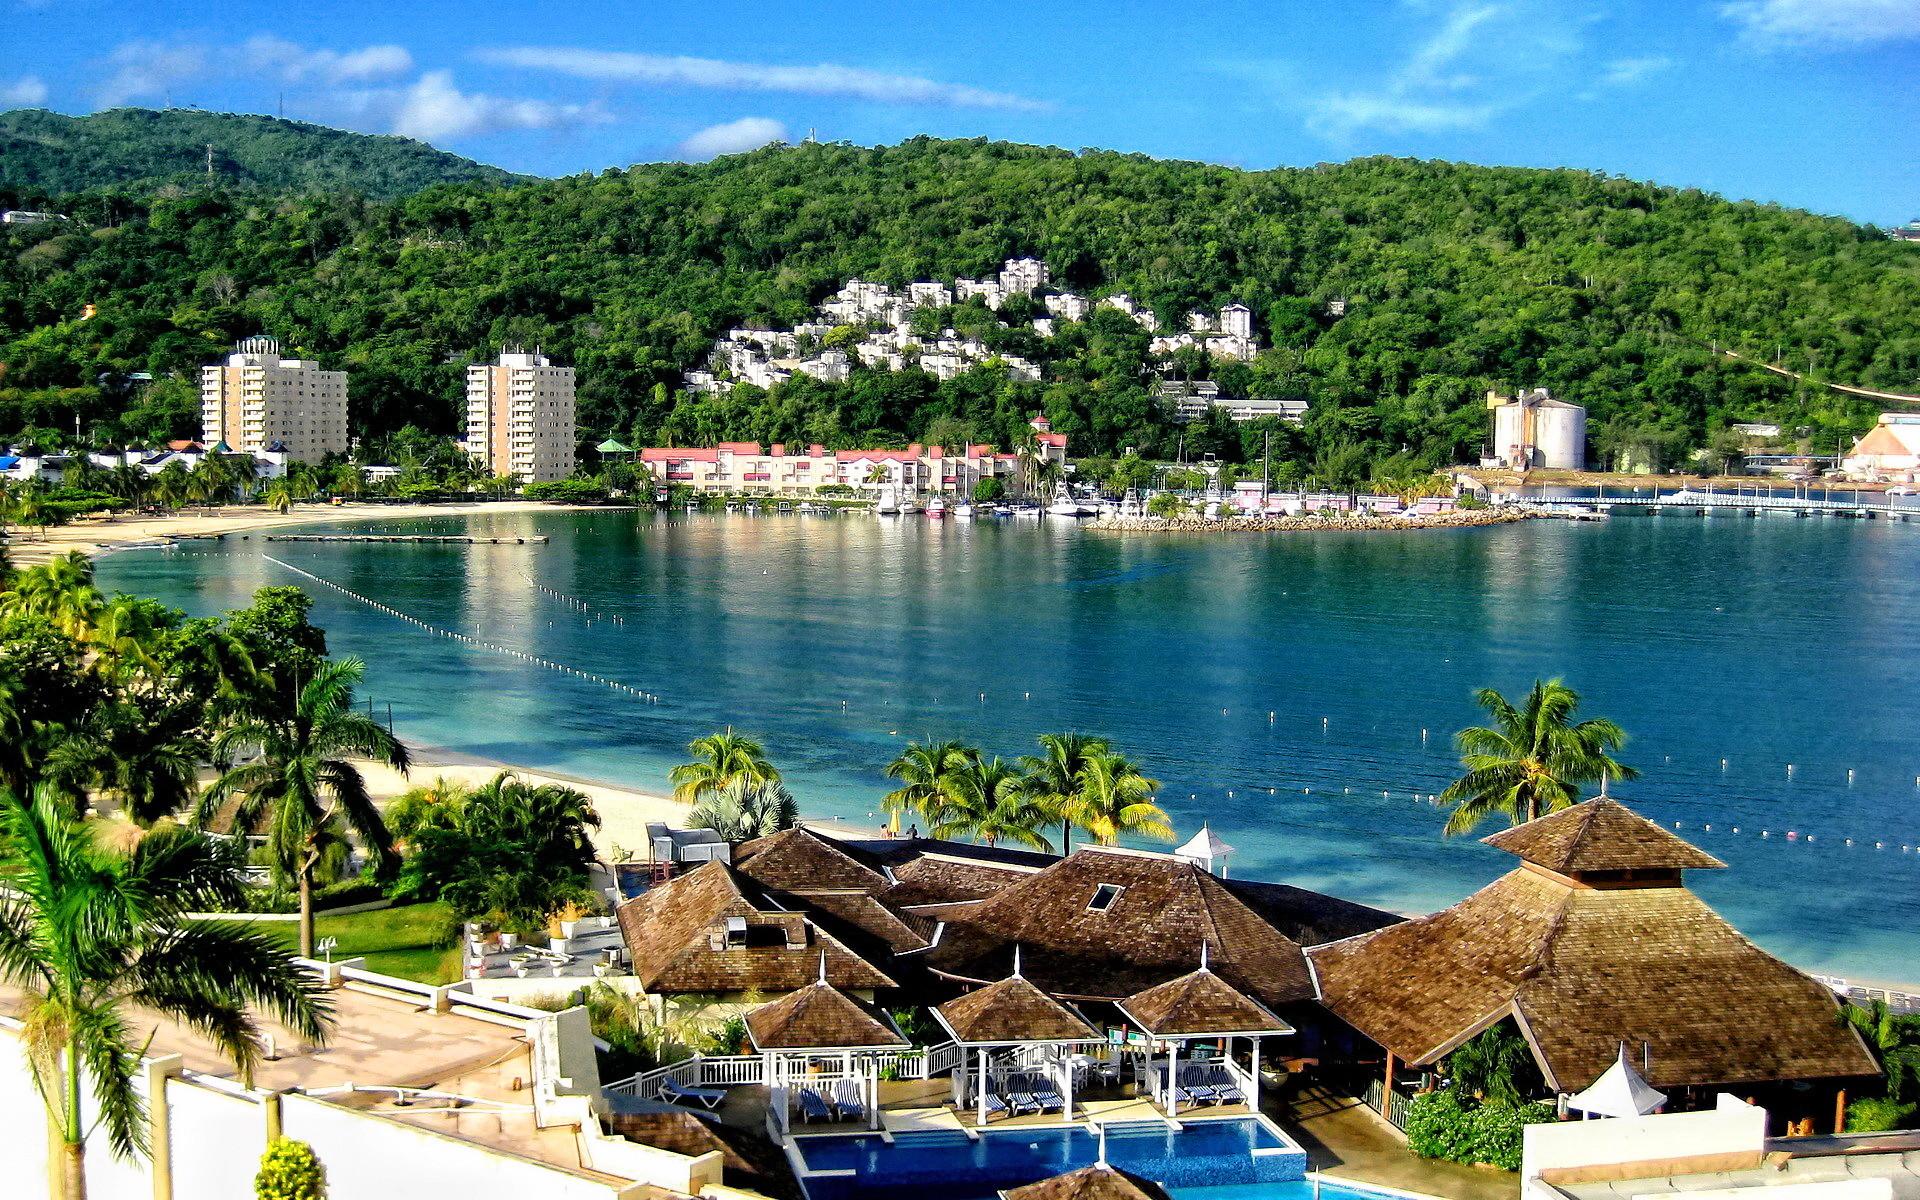 Tropical Beach Resort Free Wallpapers D2W – HD Wallpaper Desktop .